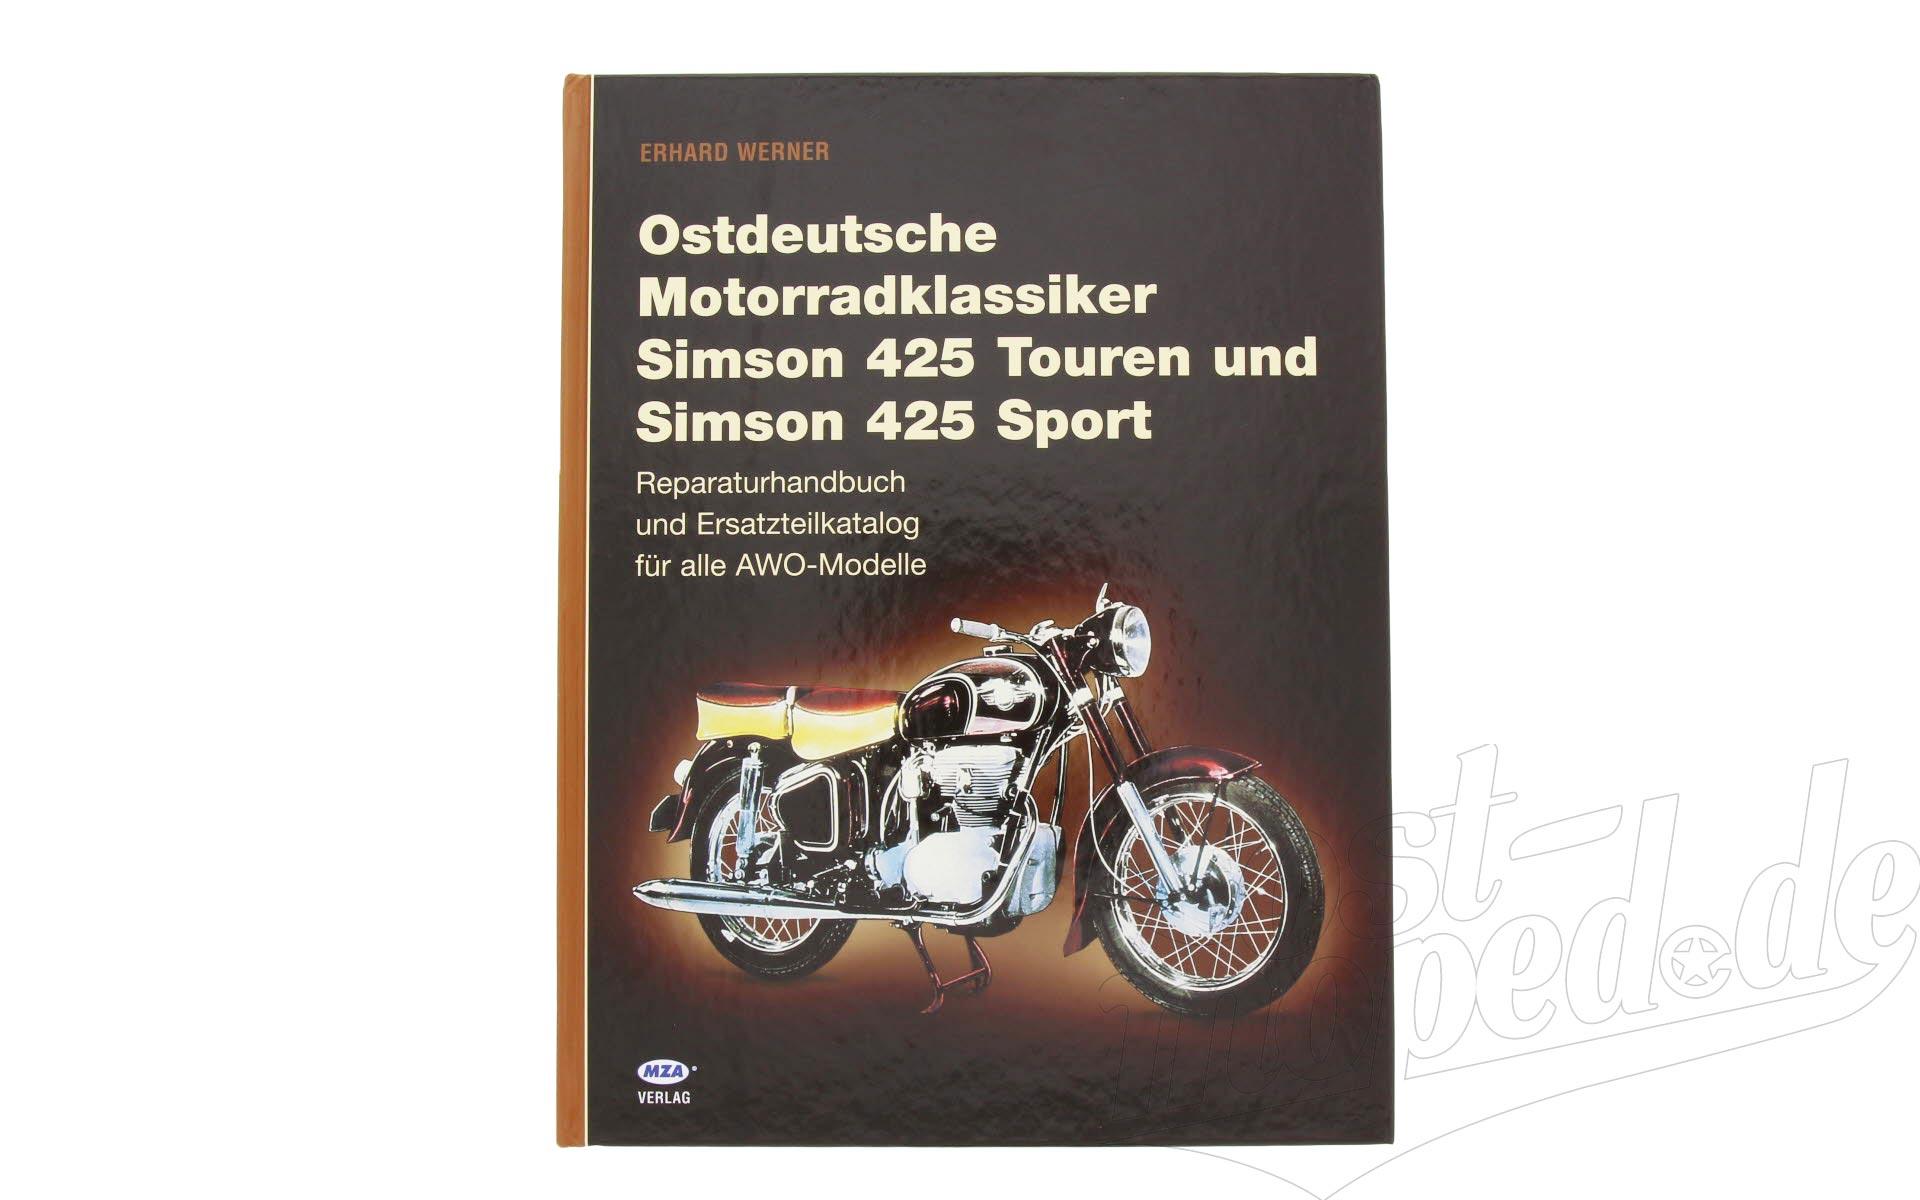 """Buch """"""""Ostdeutsche Motorradklassiker Simson 425""""""""   978-3-9809481-4-5"""